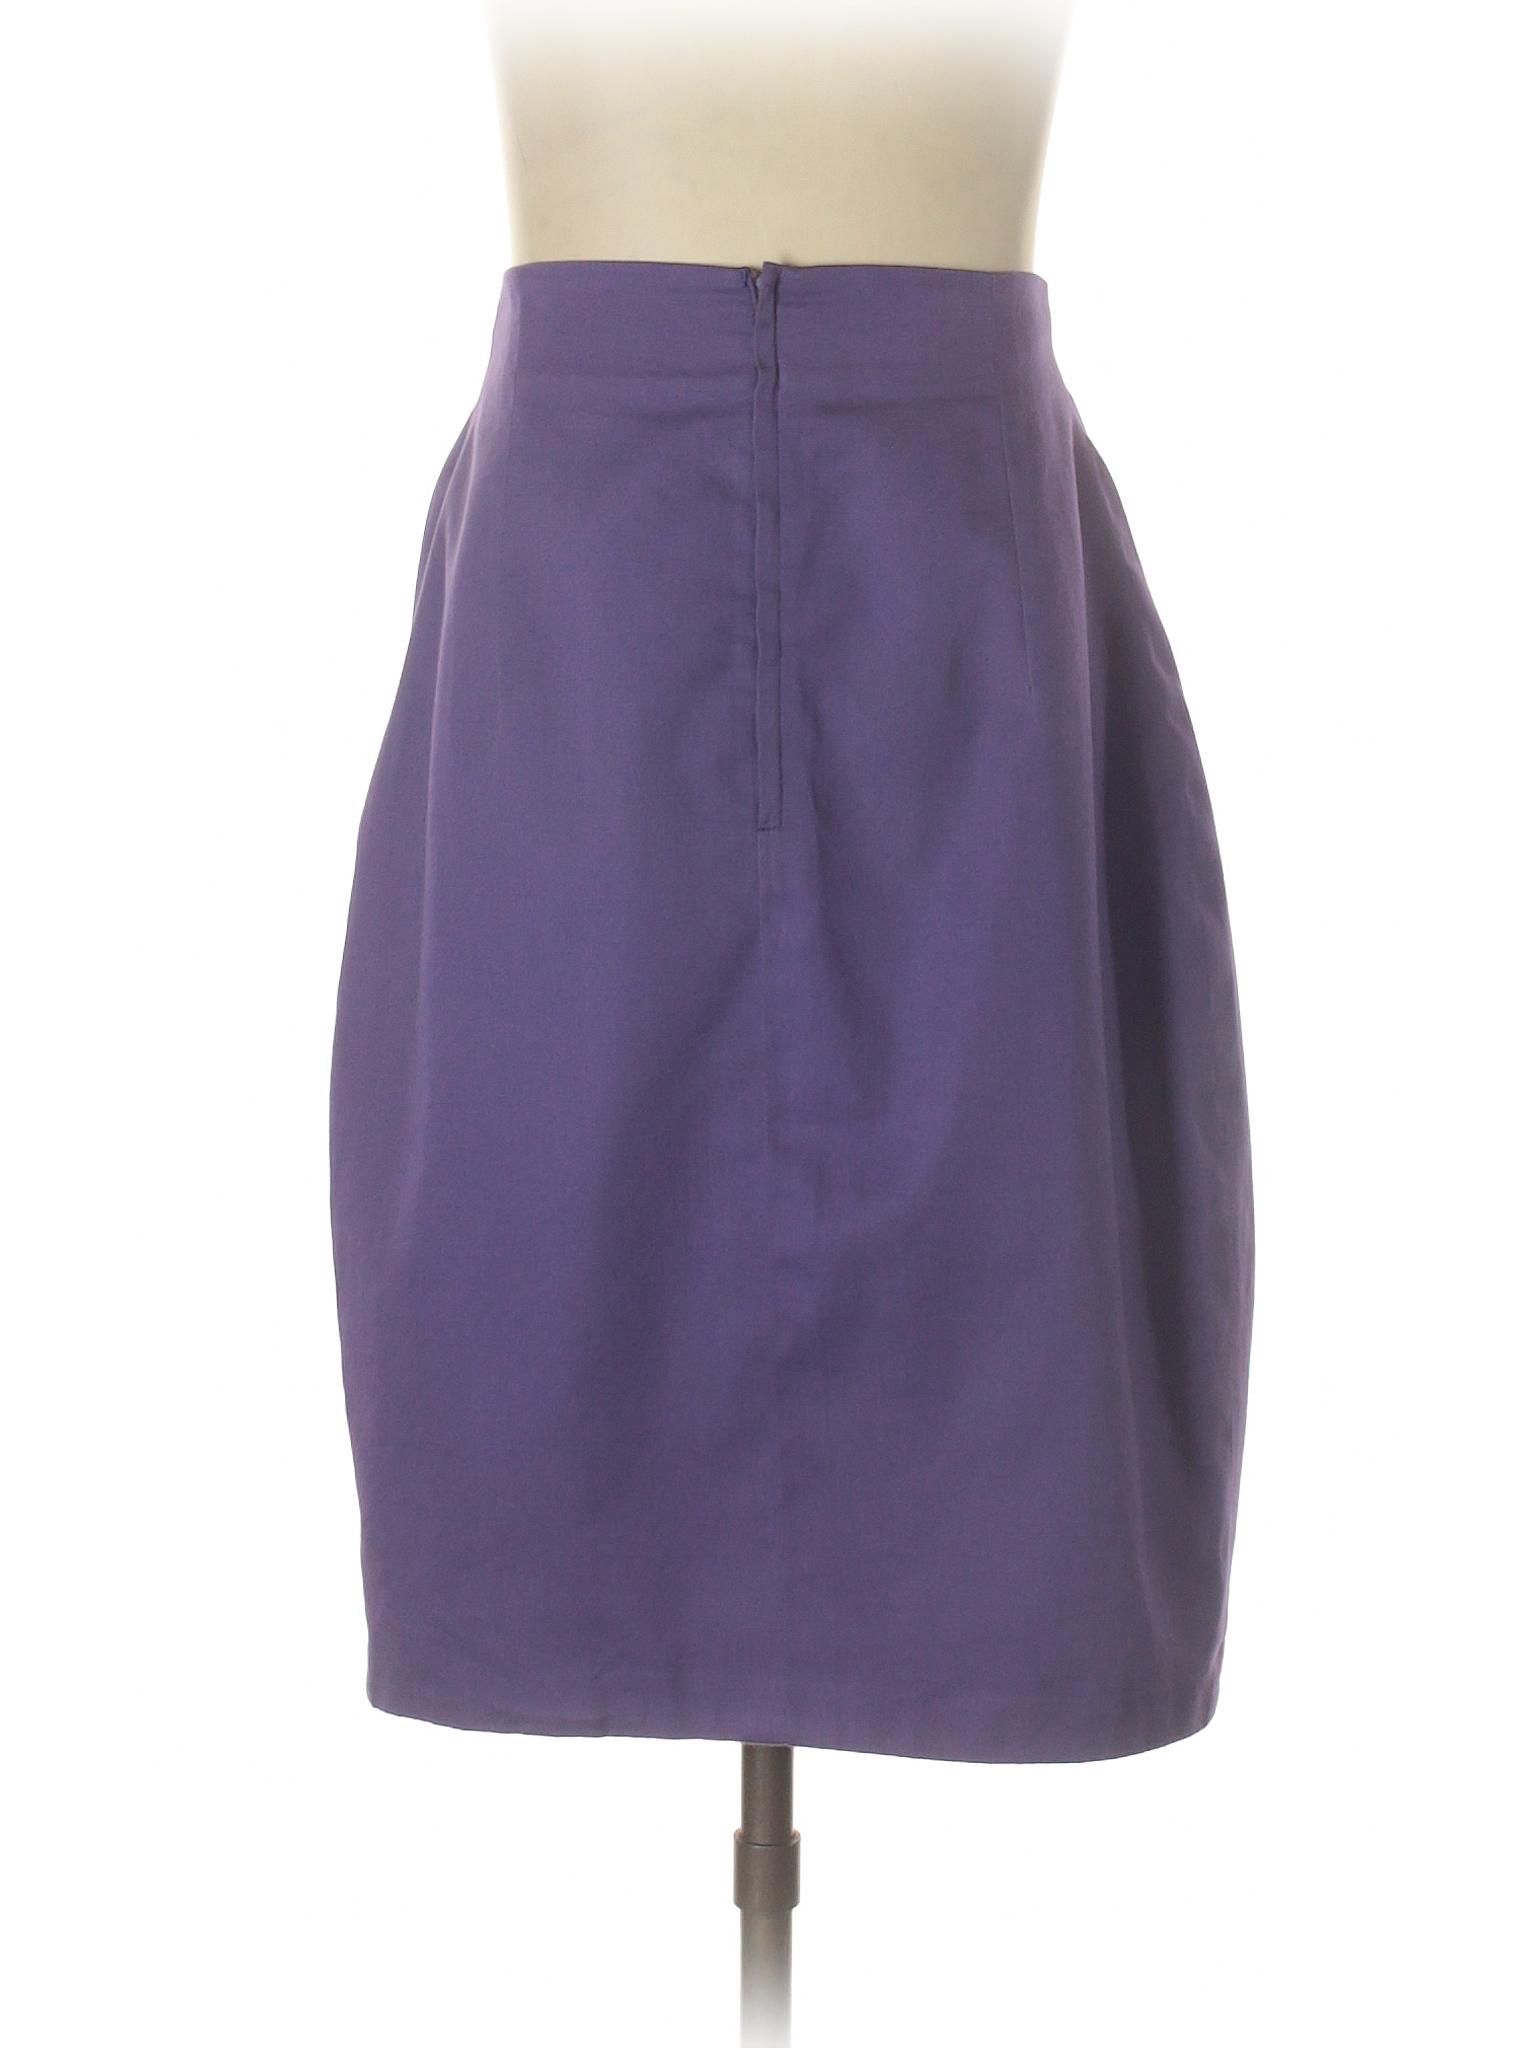 winter Skirt Leisure Gianni Versace Casual 8xqaAaw